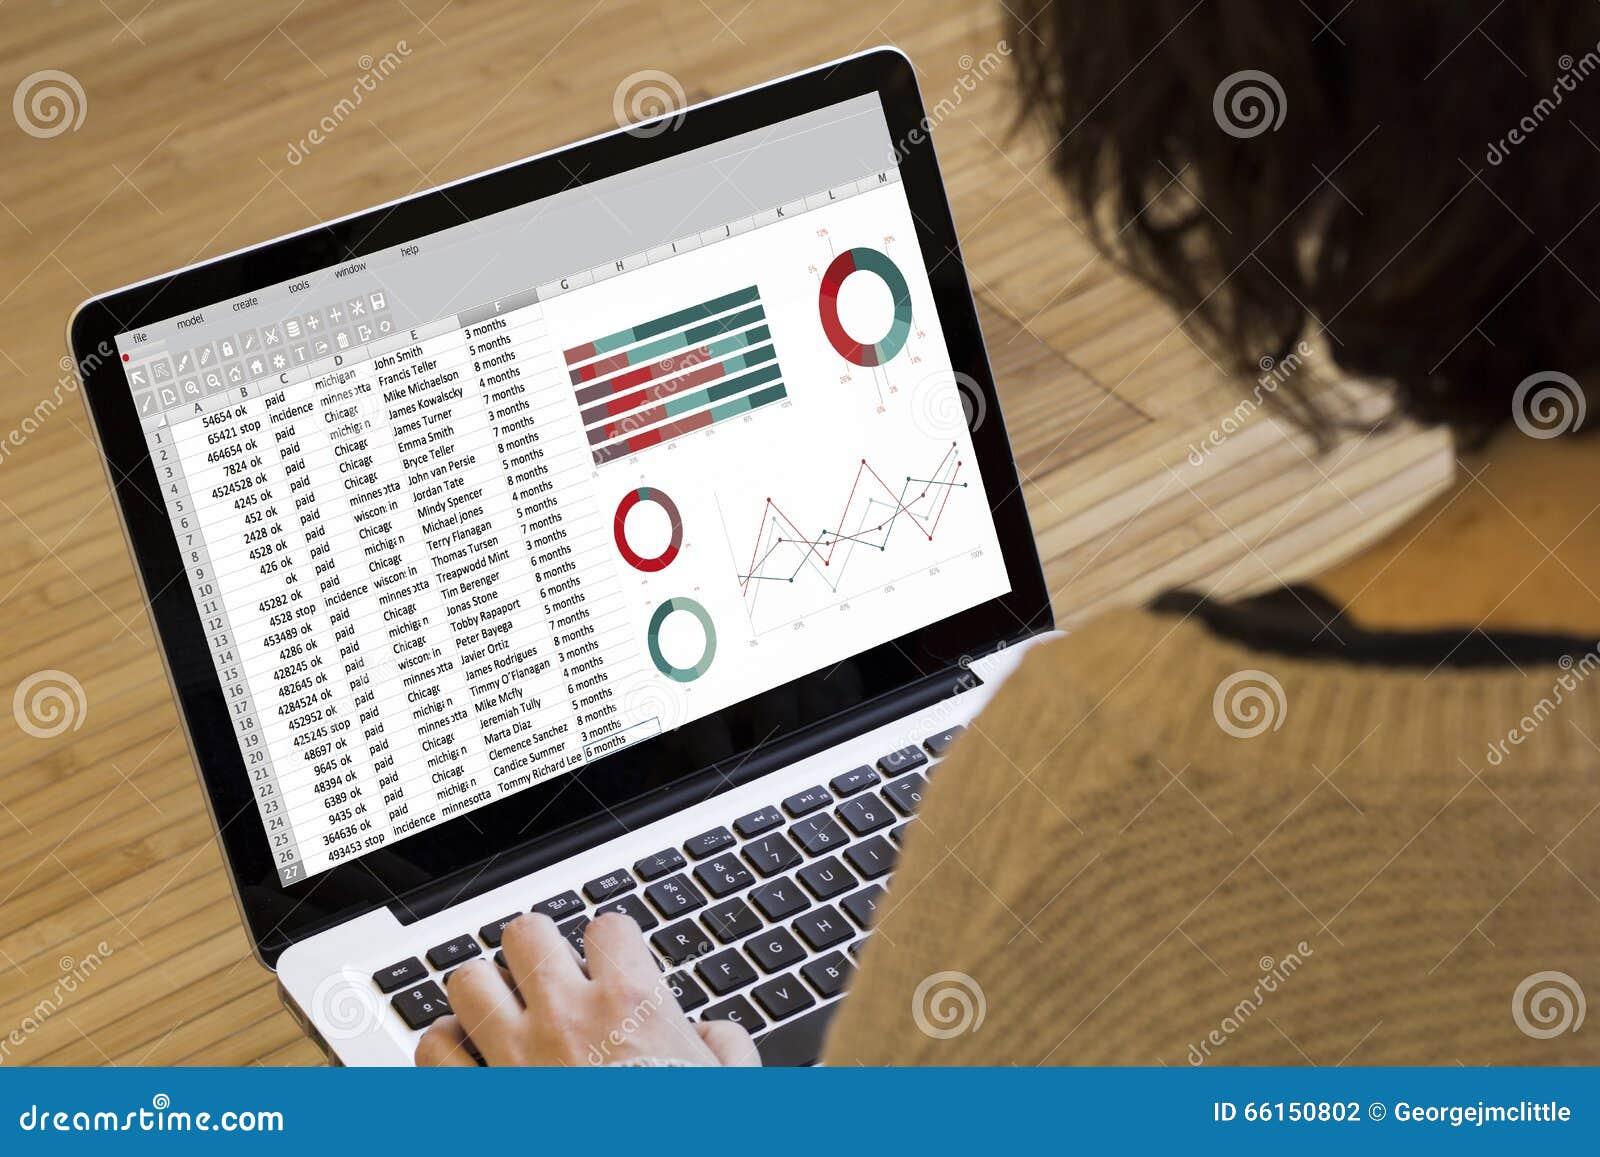 Woman Computer Spreadsheet Stock Photo Image 66150802